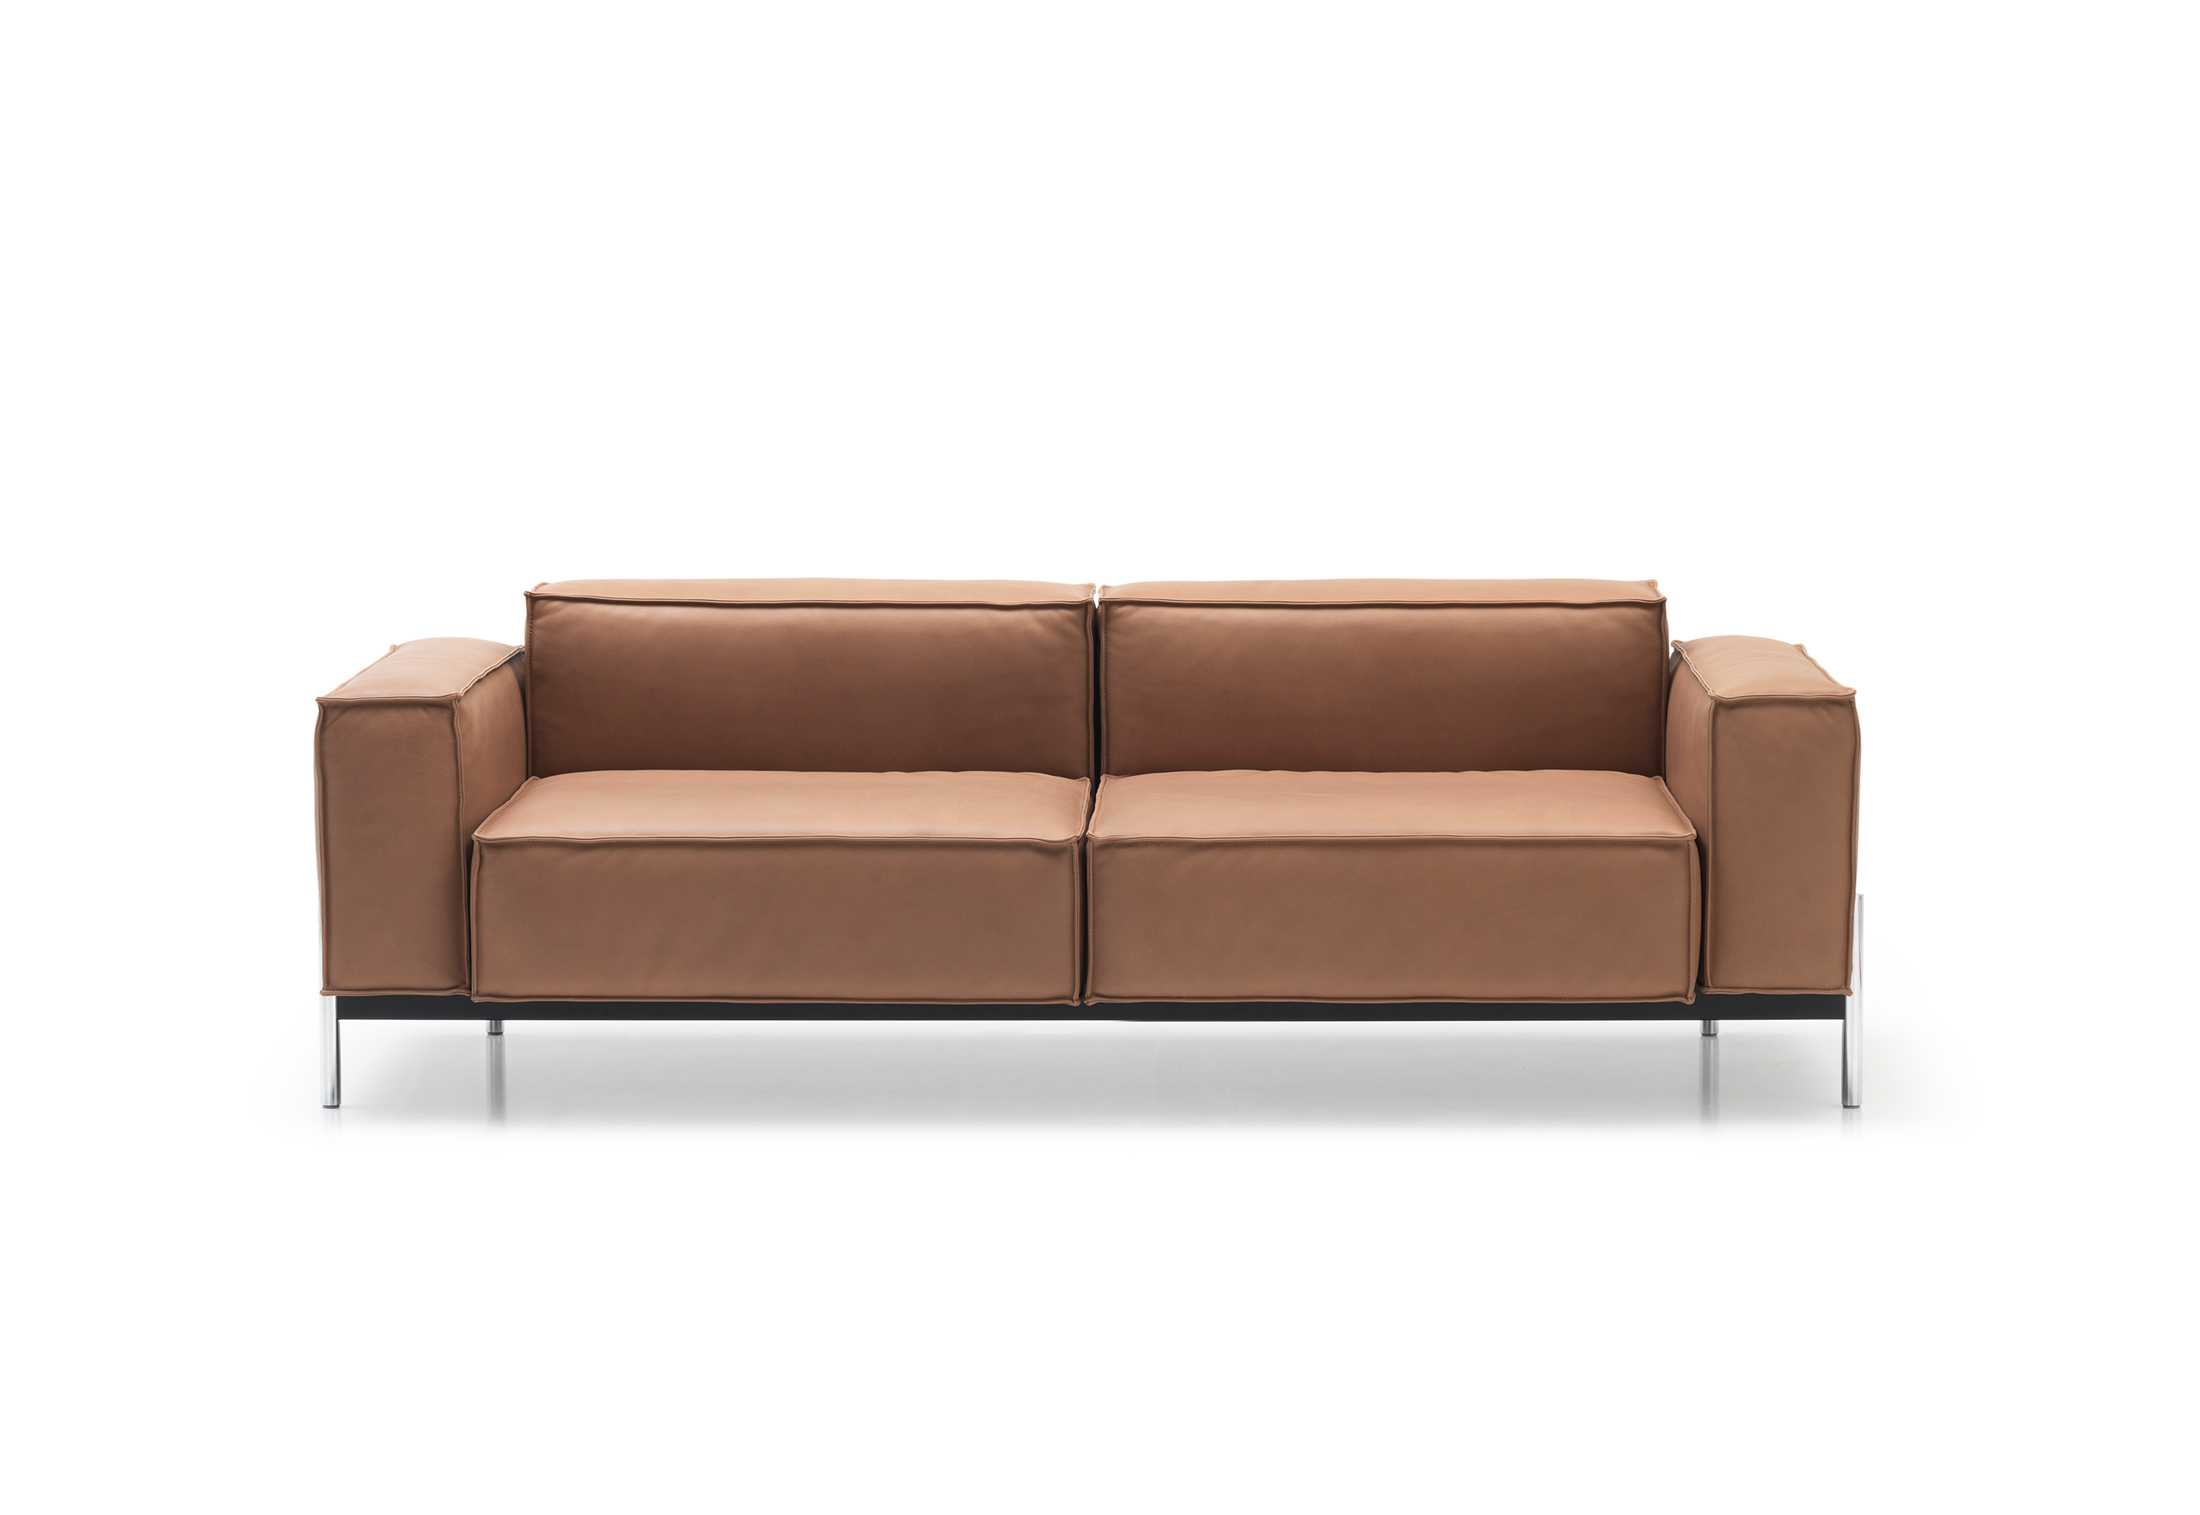 Ds 21 sofa von de sede stylepark for Sitzlandschaft sofa